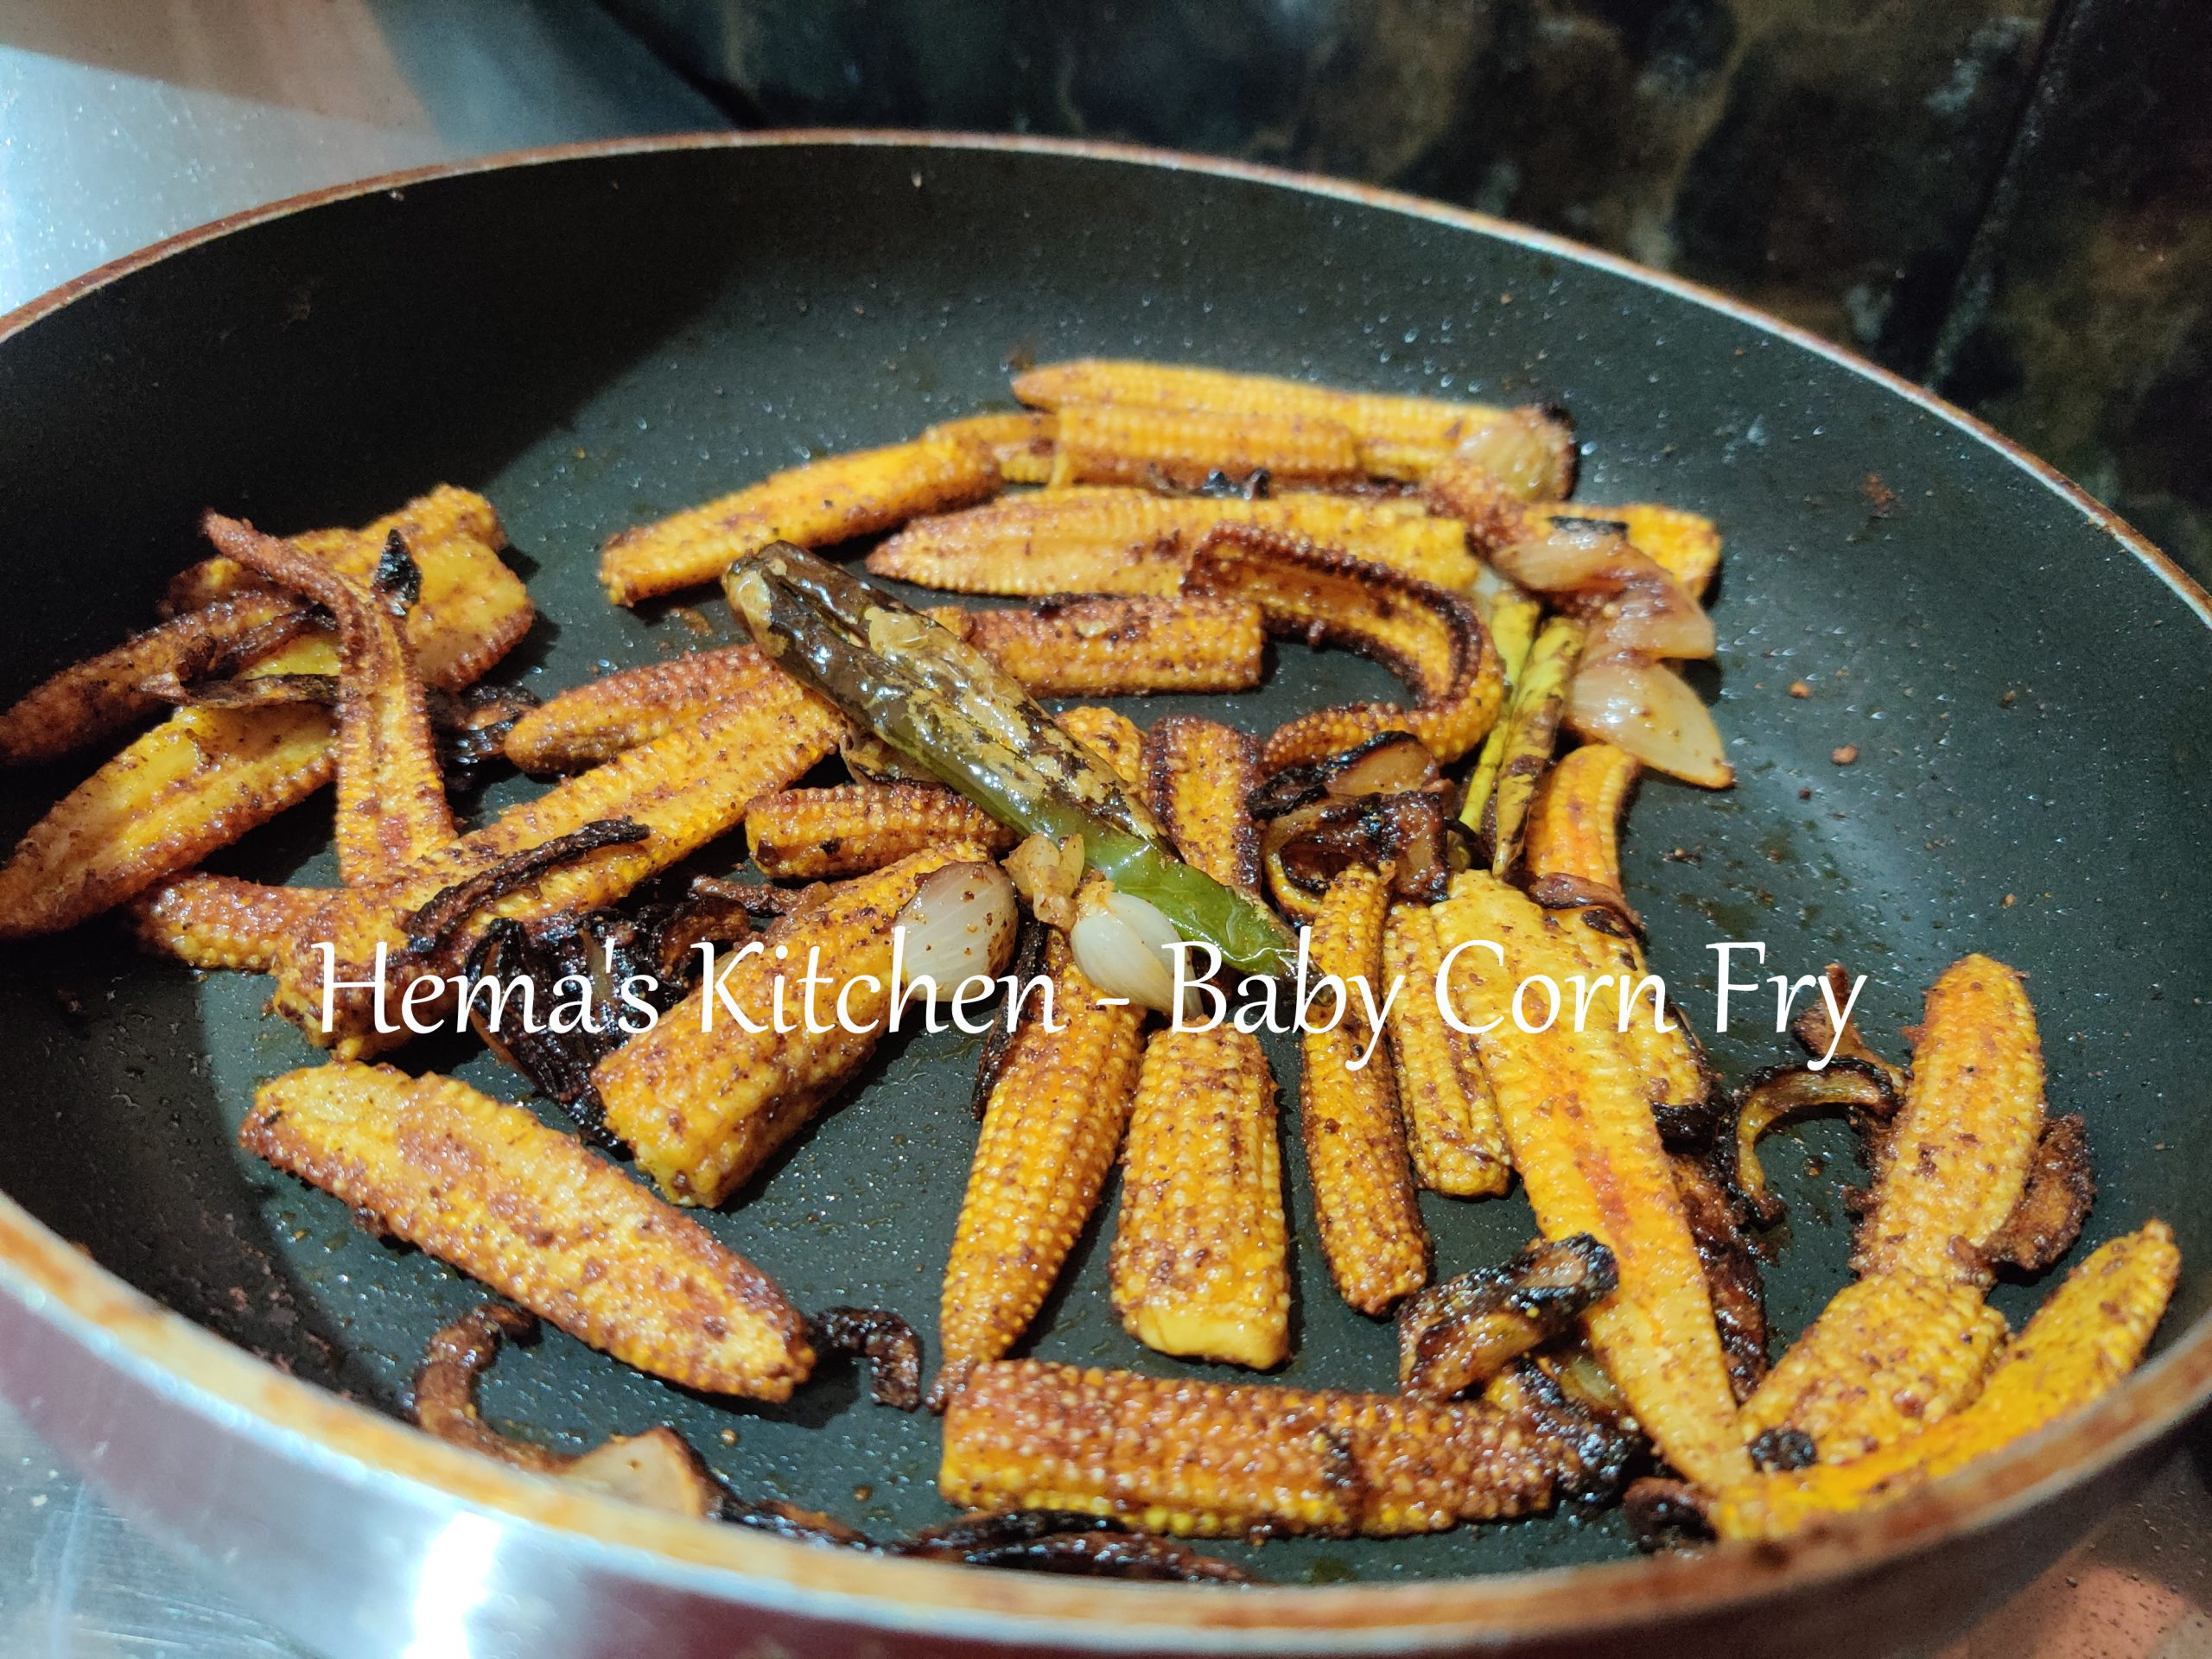 Baby corn Fry